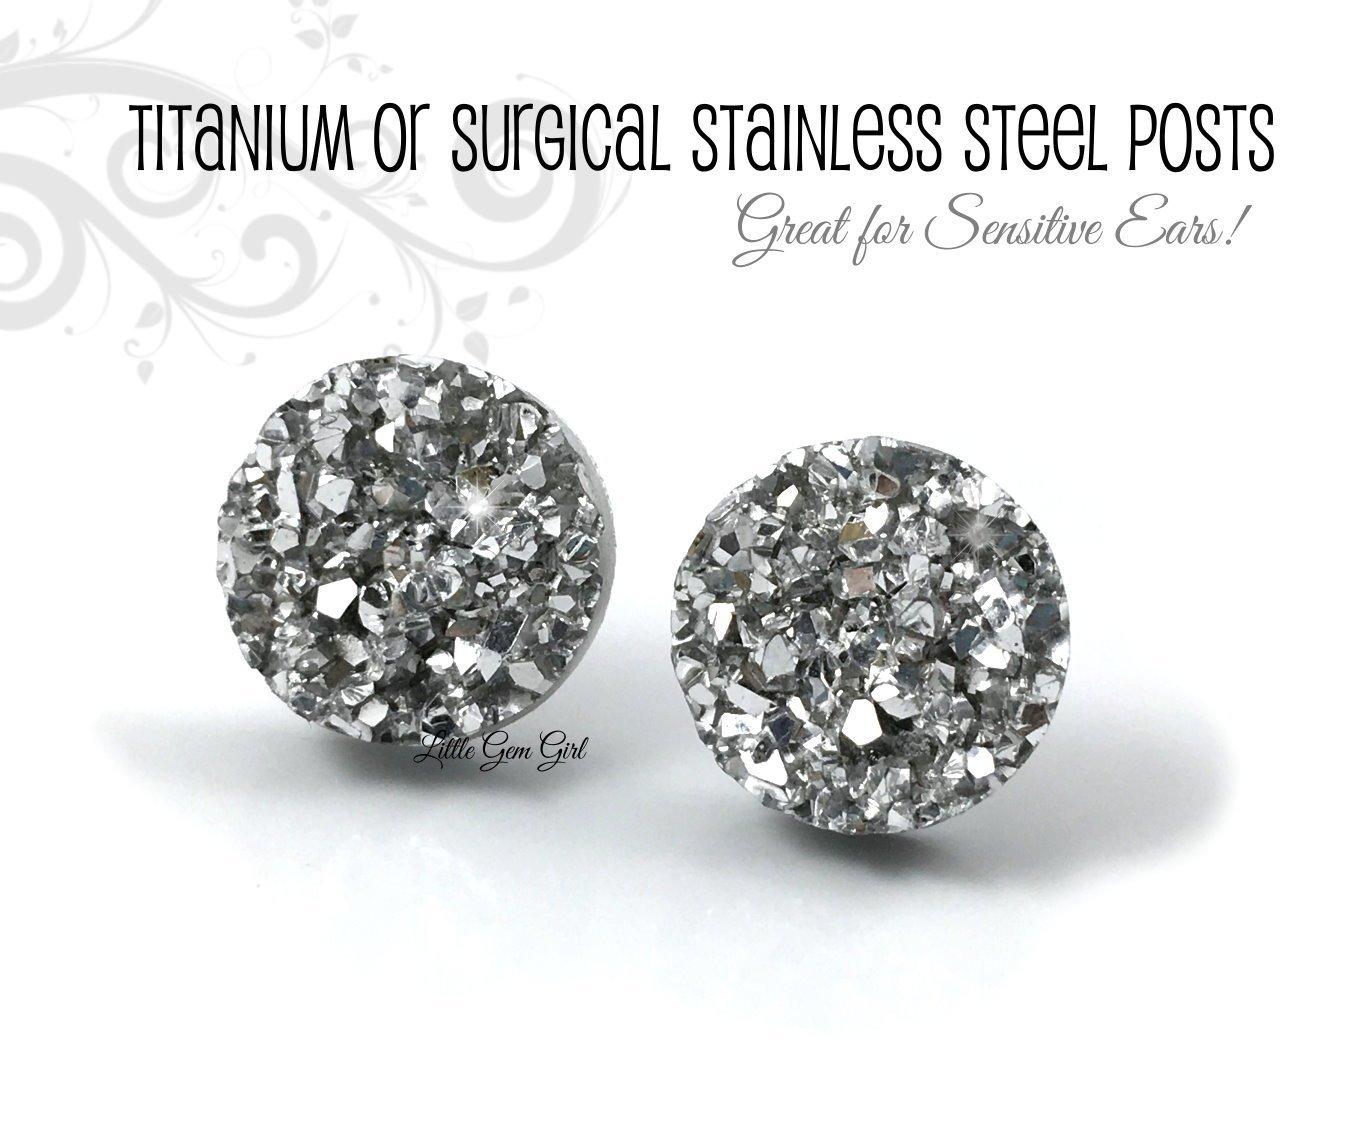 341d781fe ... Metallic Silver Druzy Earrings - 8mm, 10mm or 12mm w/Titanium or  Stainless Steel Posts Nickel Free for Sensitive Ears - Faux Silver Glitter  Druzy Studs